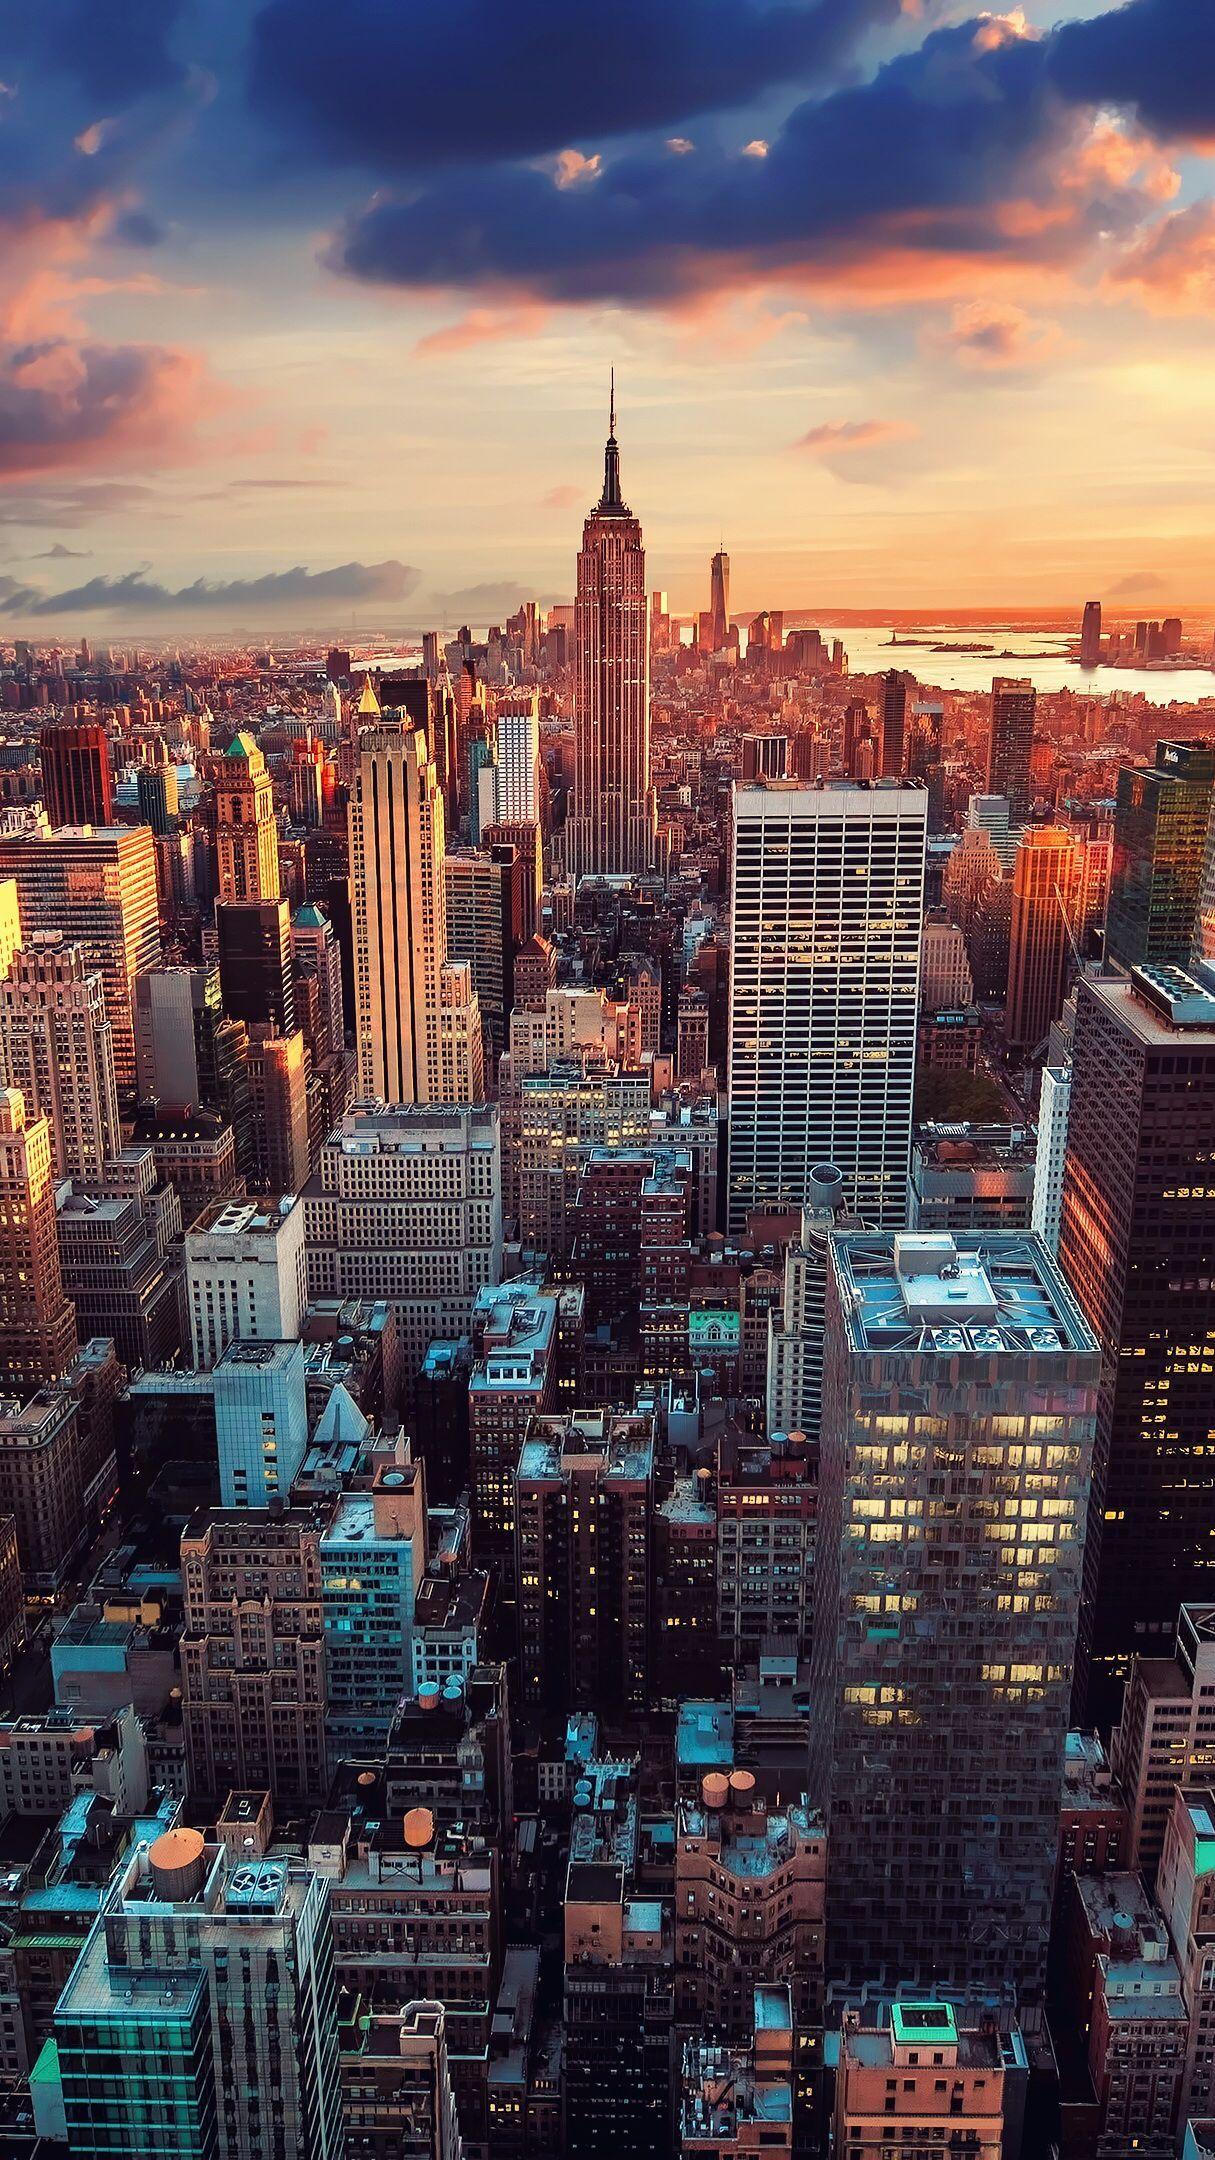 Fondos De Pantalla Tumblr Wallpapers Nyc Background New York Wallpaper City Aesthetic